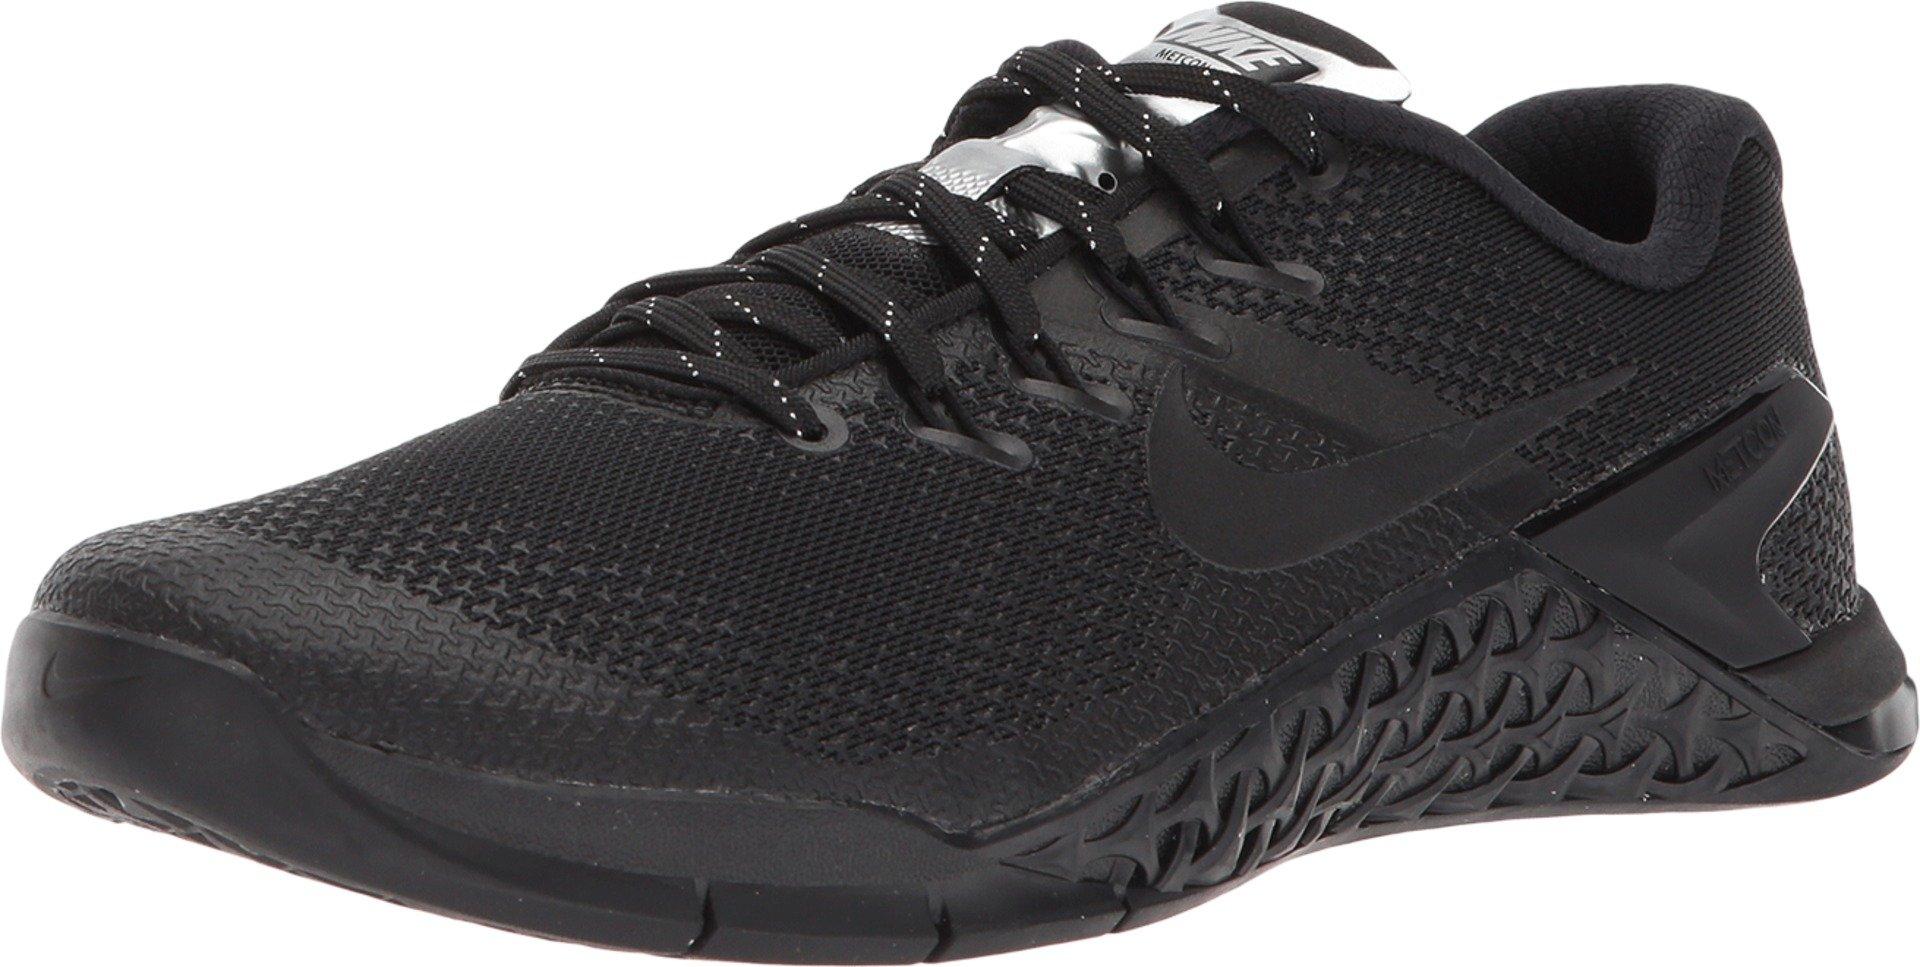 7b4d4db14c7e Galleon - Nike Women s Metcon 4 Selfie Training Shoe